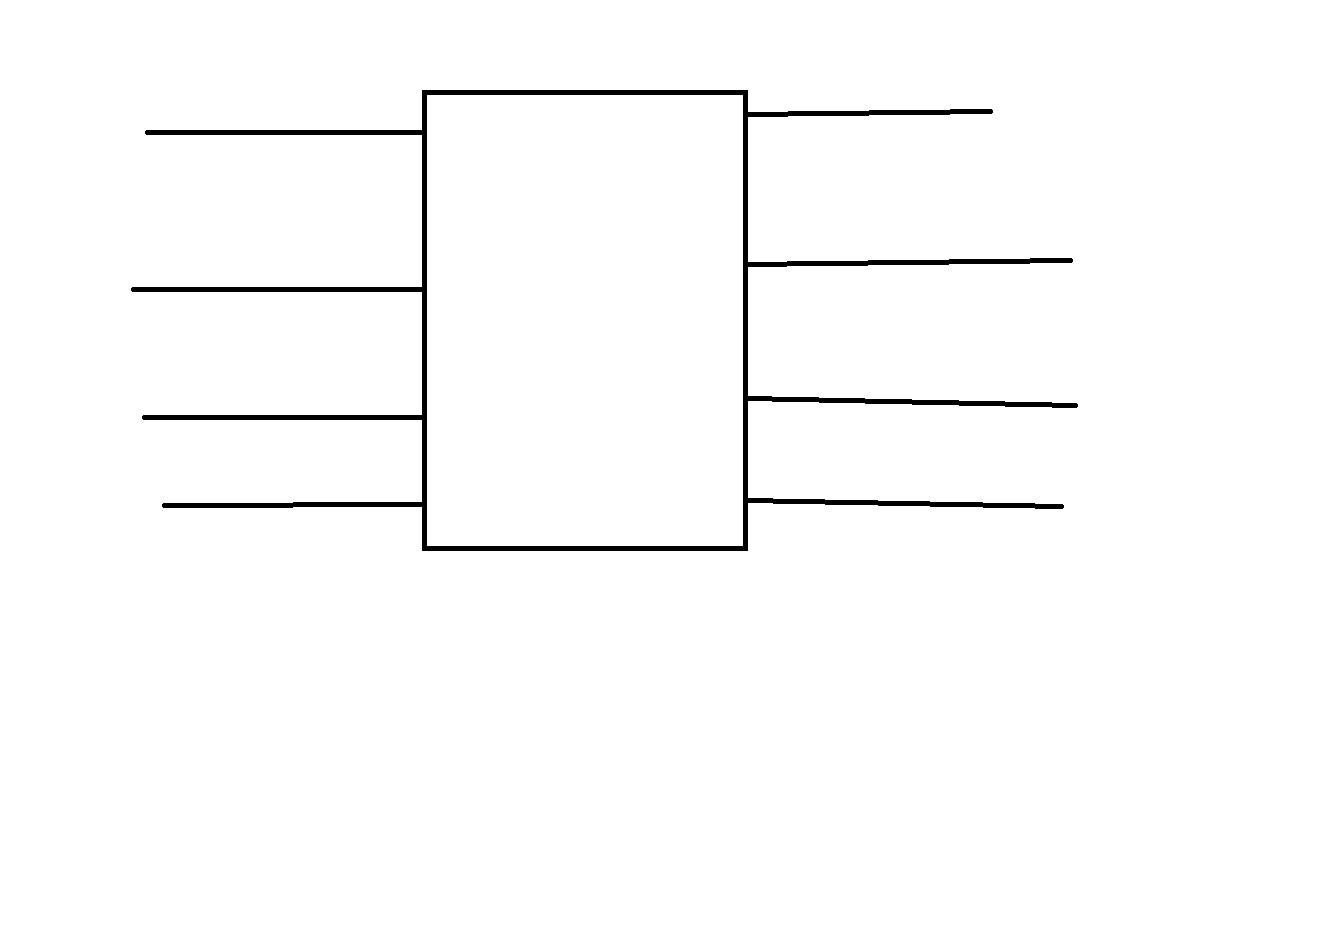 Circuito Integrado Simbolo : Mantenimiento de equipos computo componentes